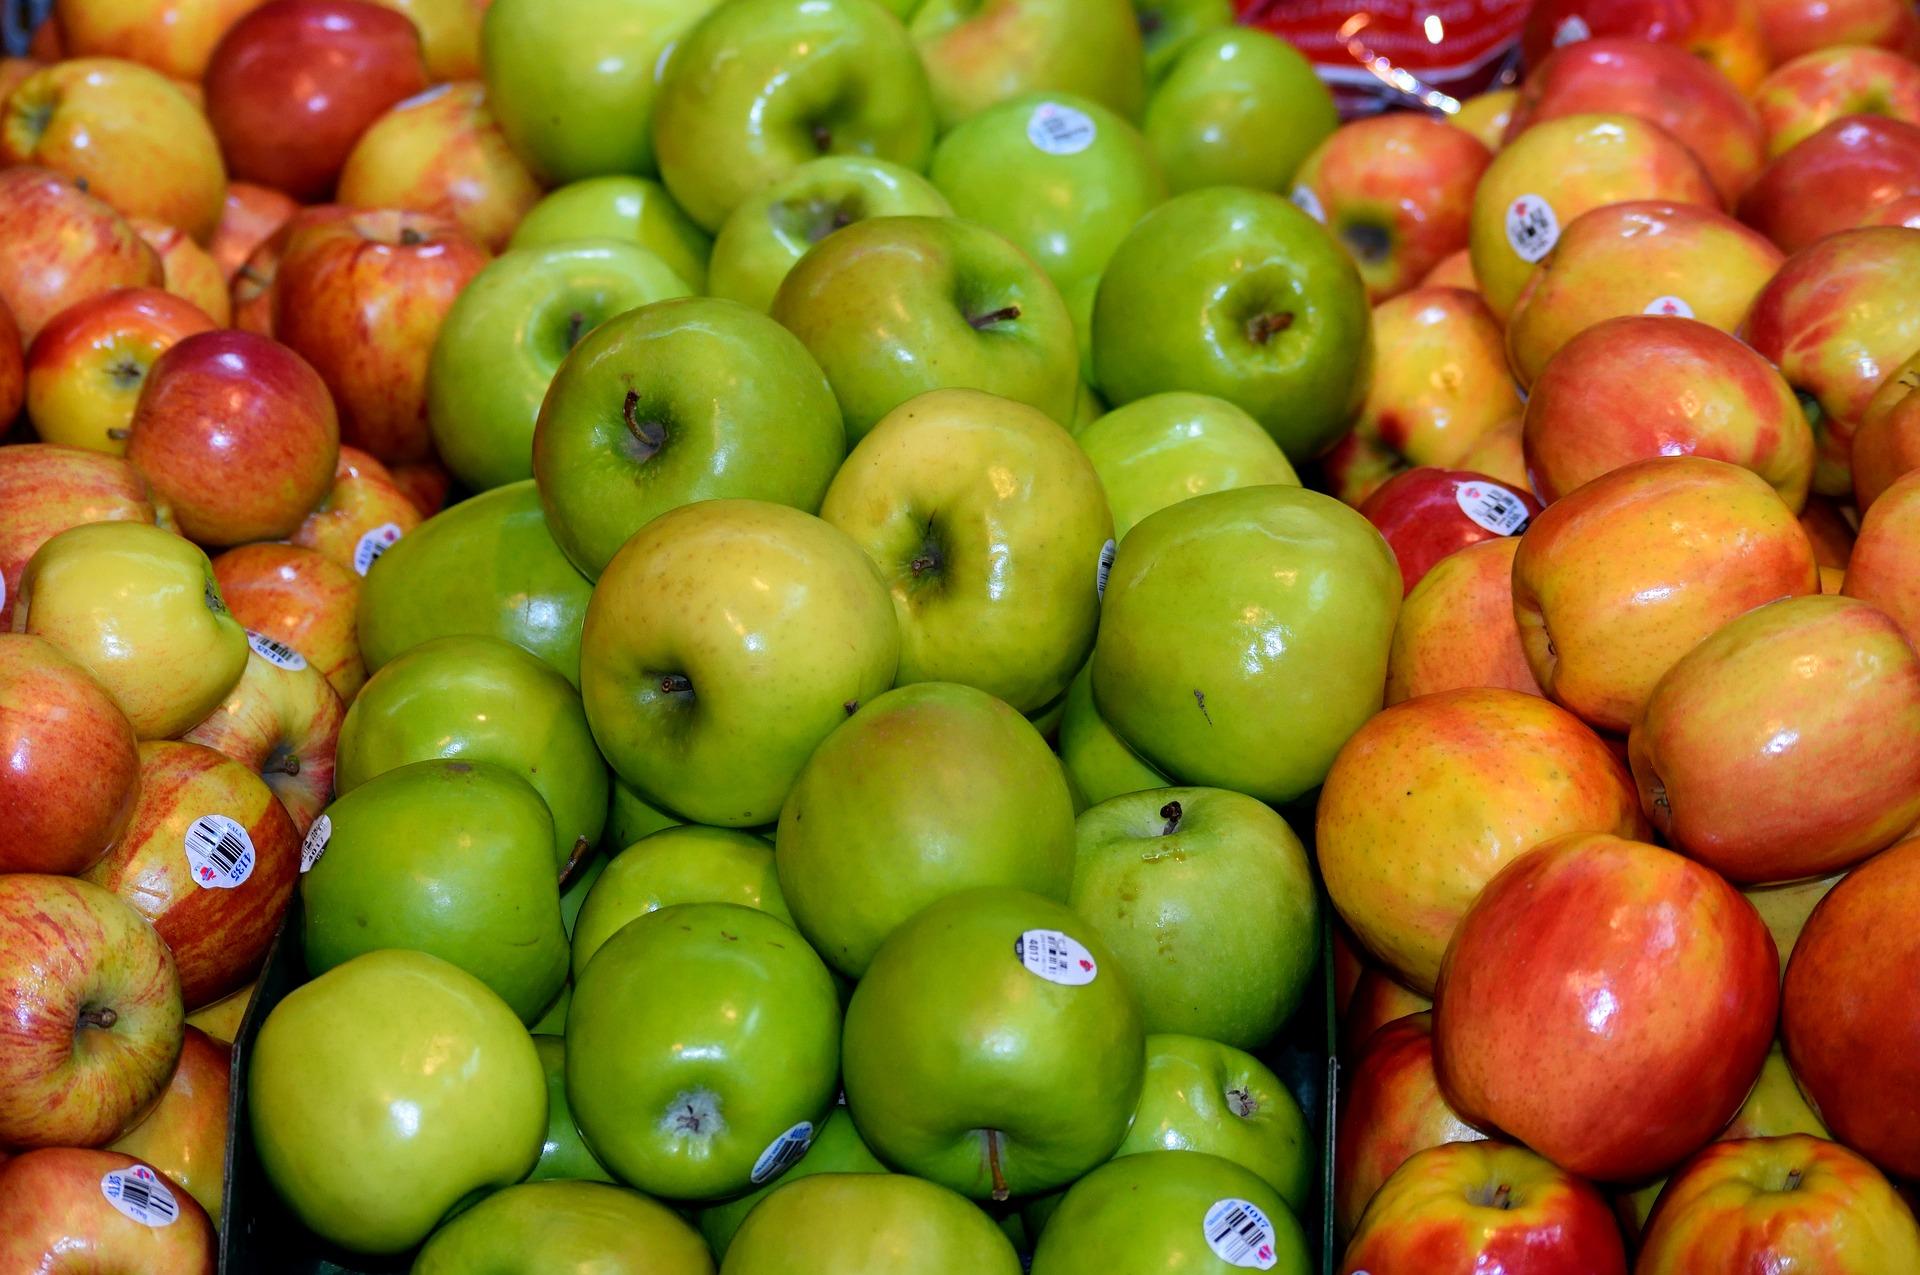 apples 2677356 1920